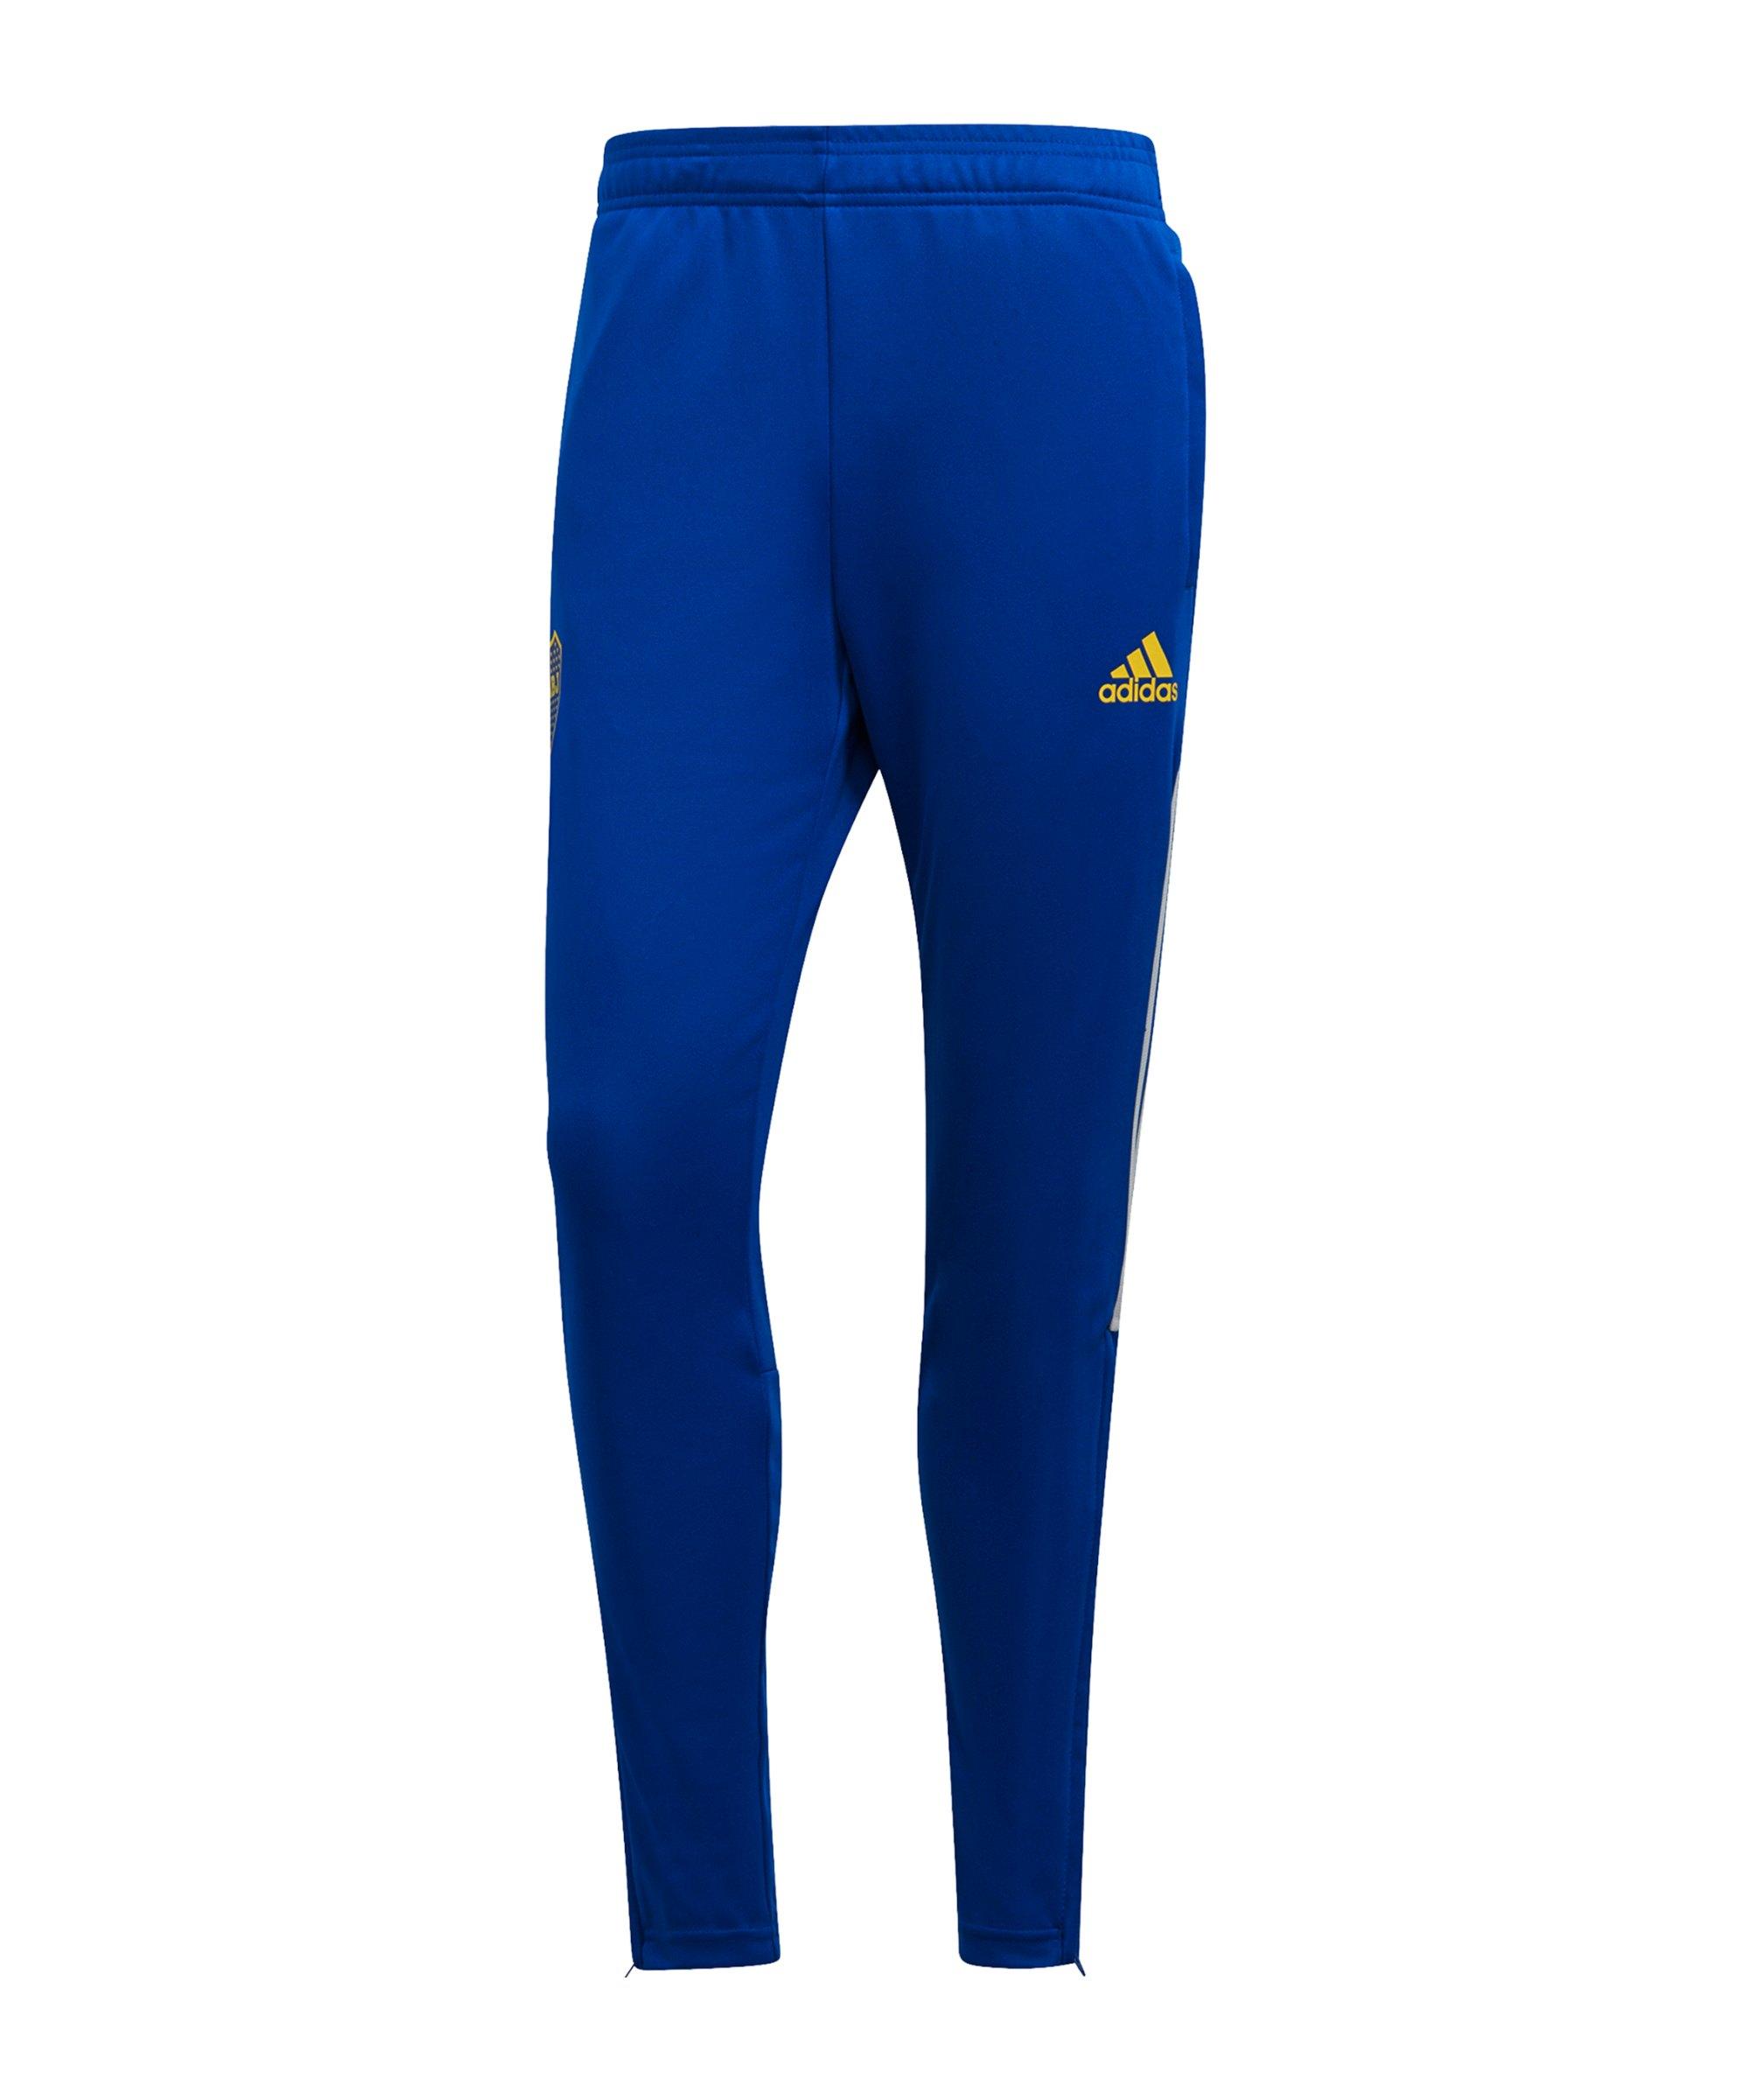 adidas Boca Juniors Trainingshose Blau - blau